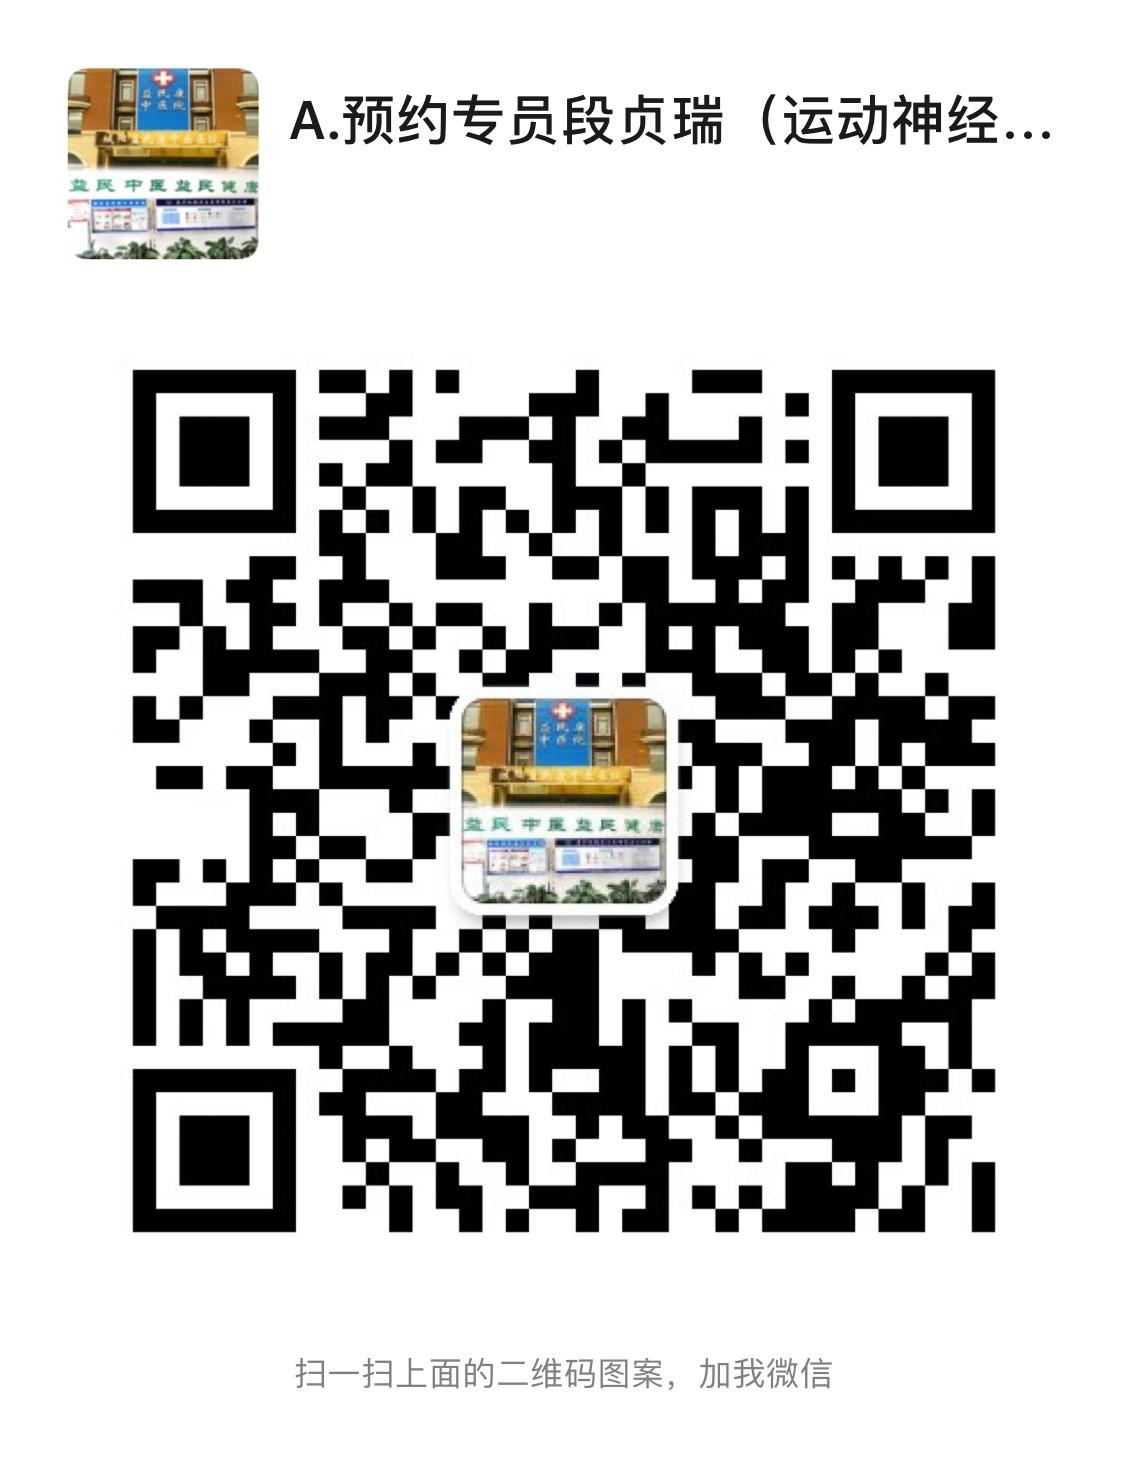 IMG_5091(20200601-160248).JPG